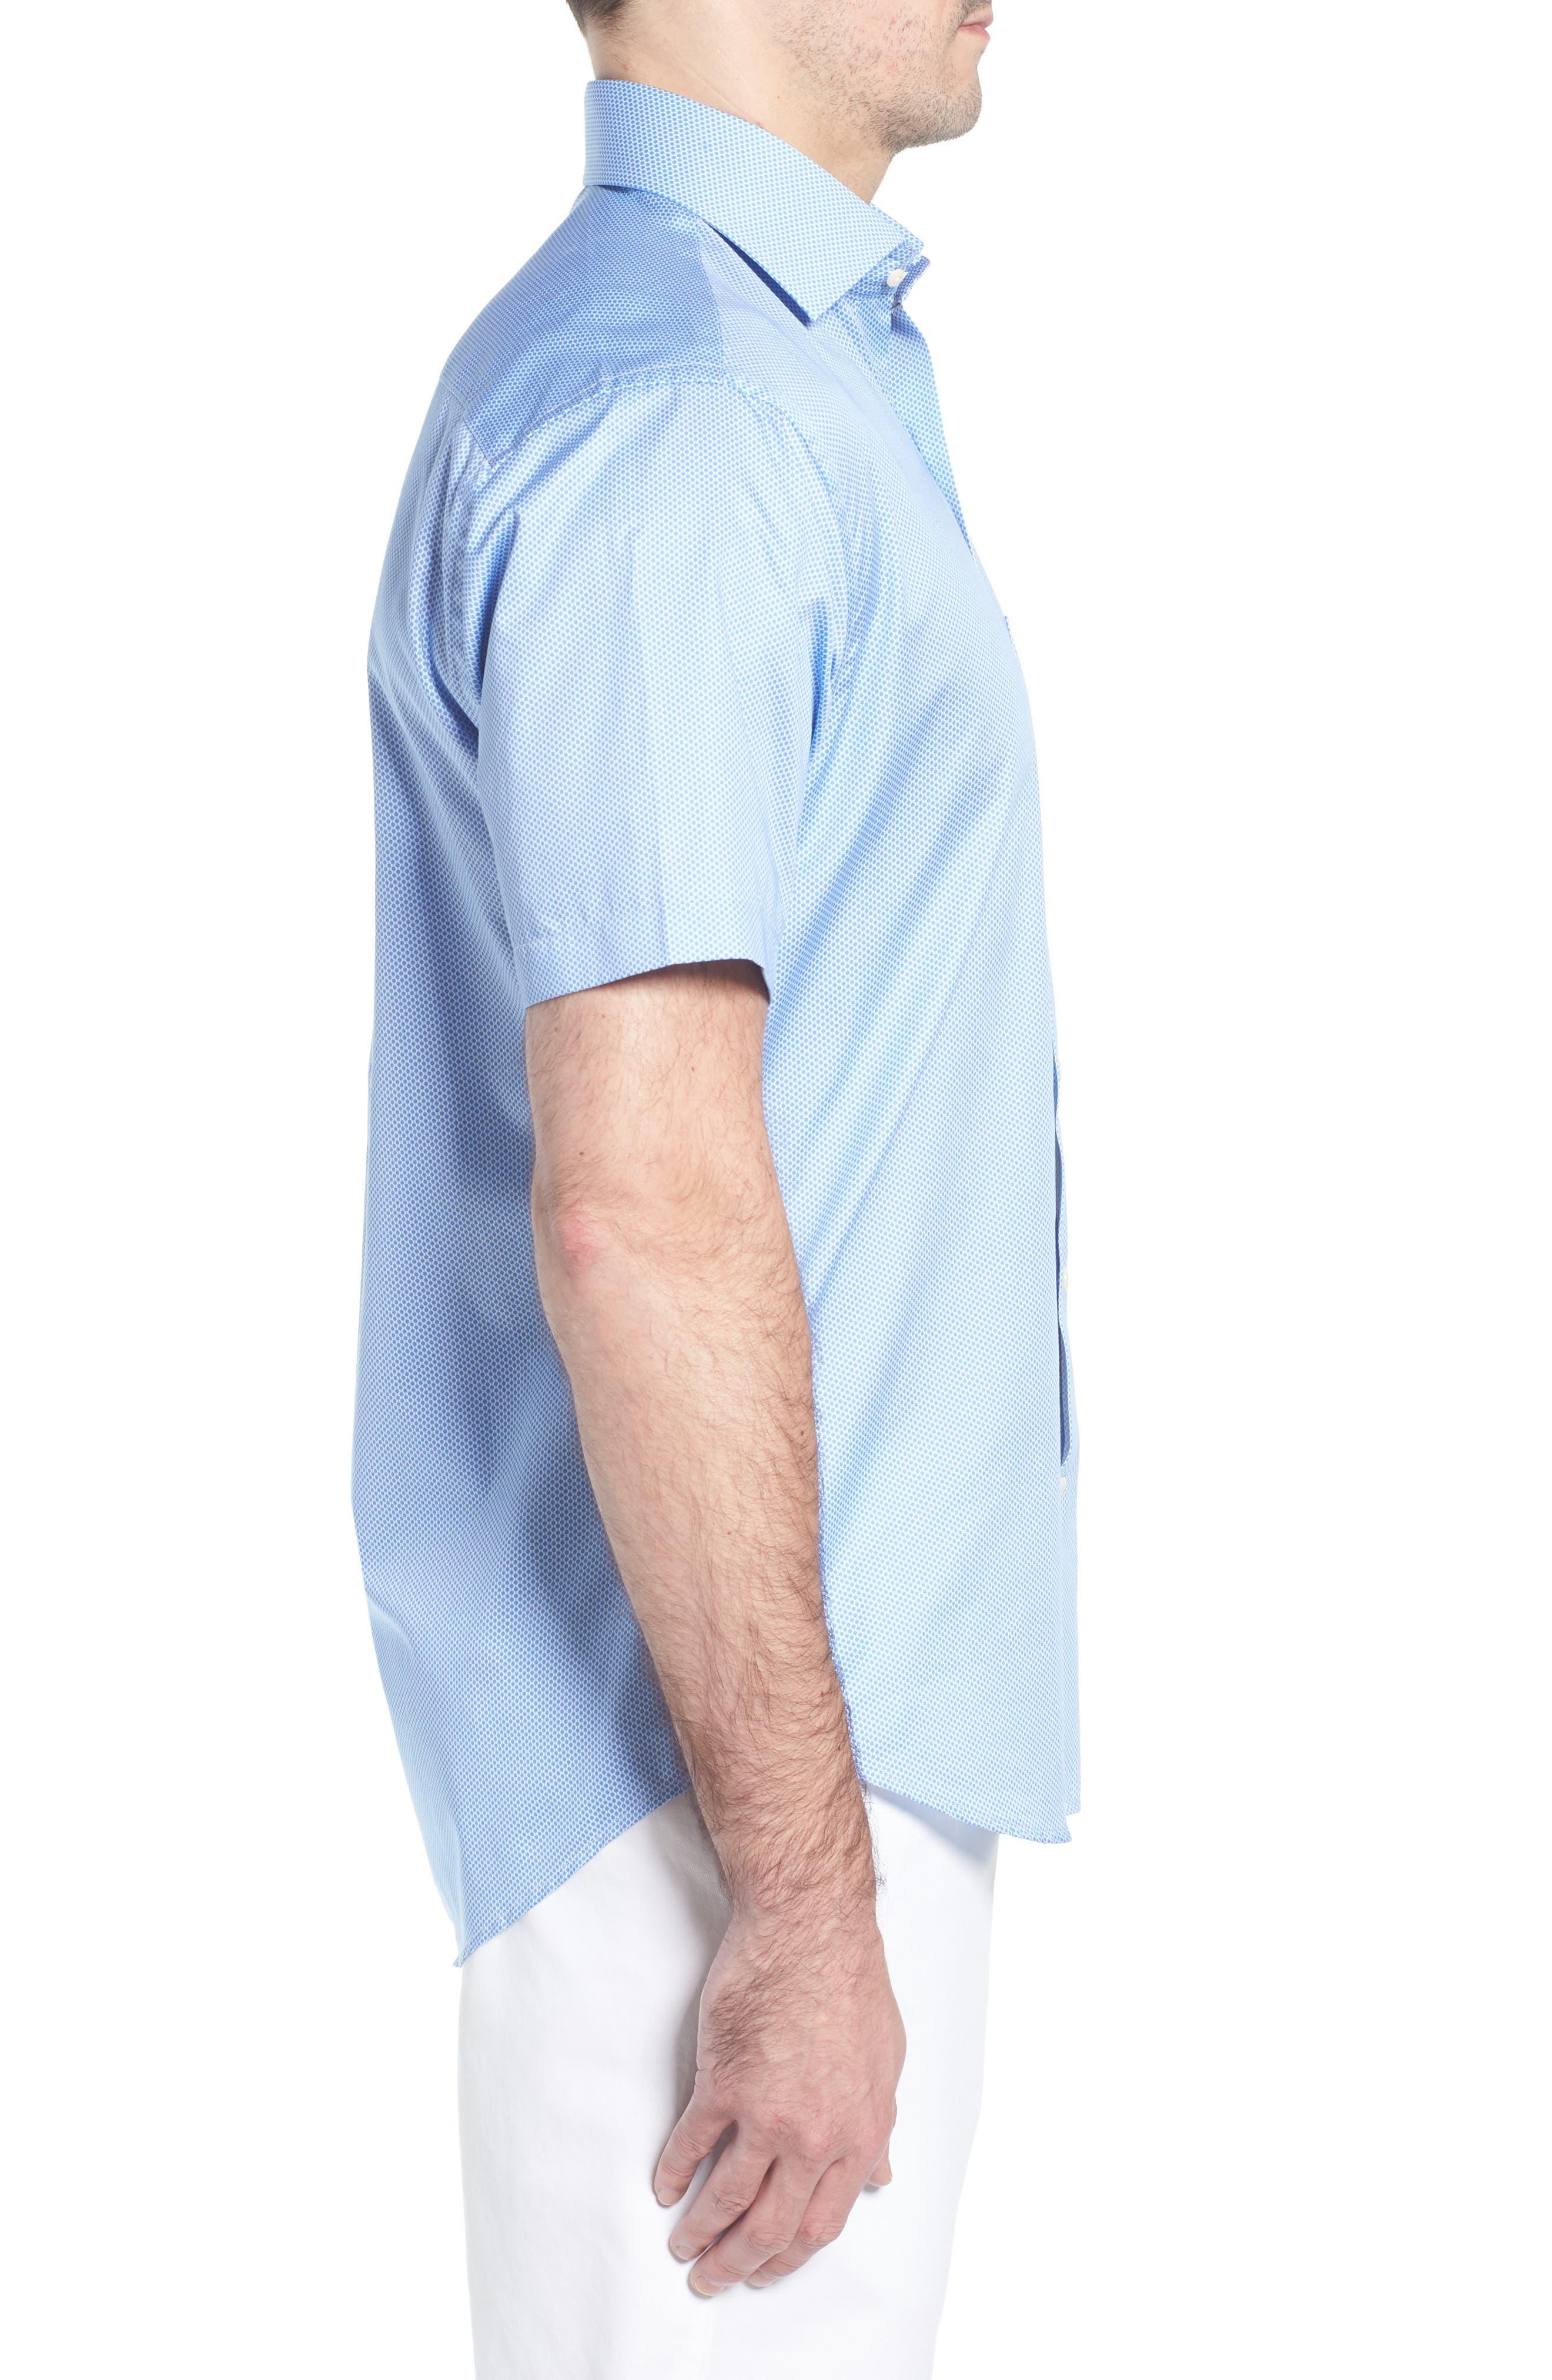 Crown Ease Connecting the Dots Sport Shirt,                             Alternate thumbnail 4, color,                             Atlas Blue